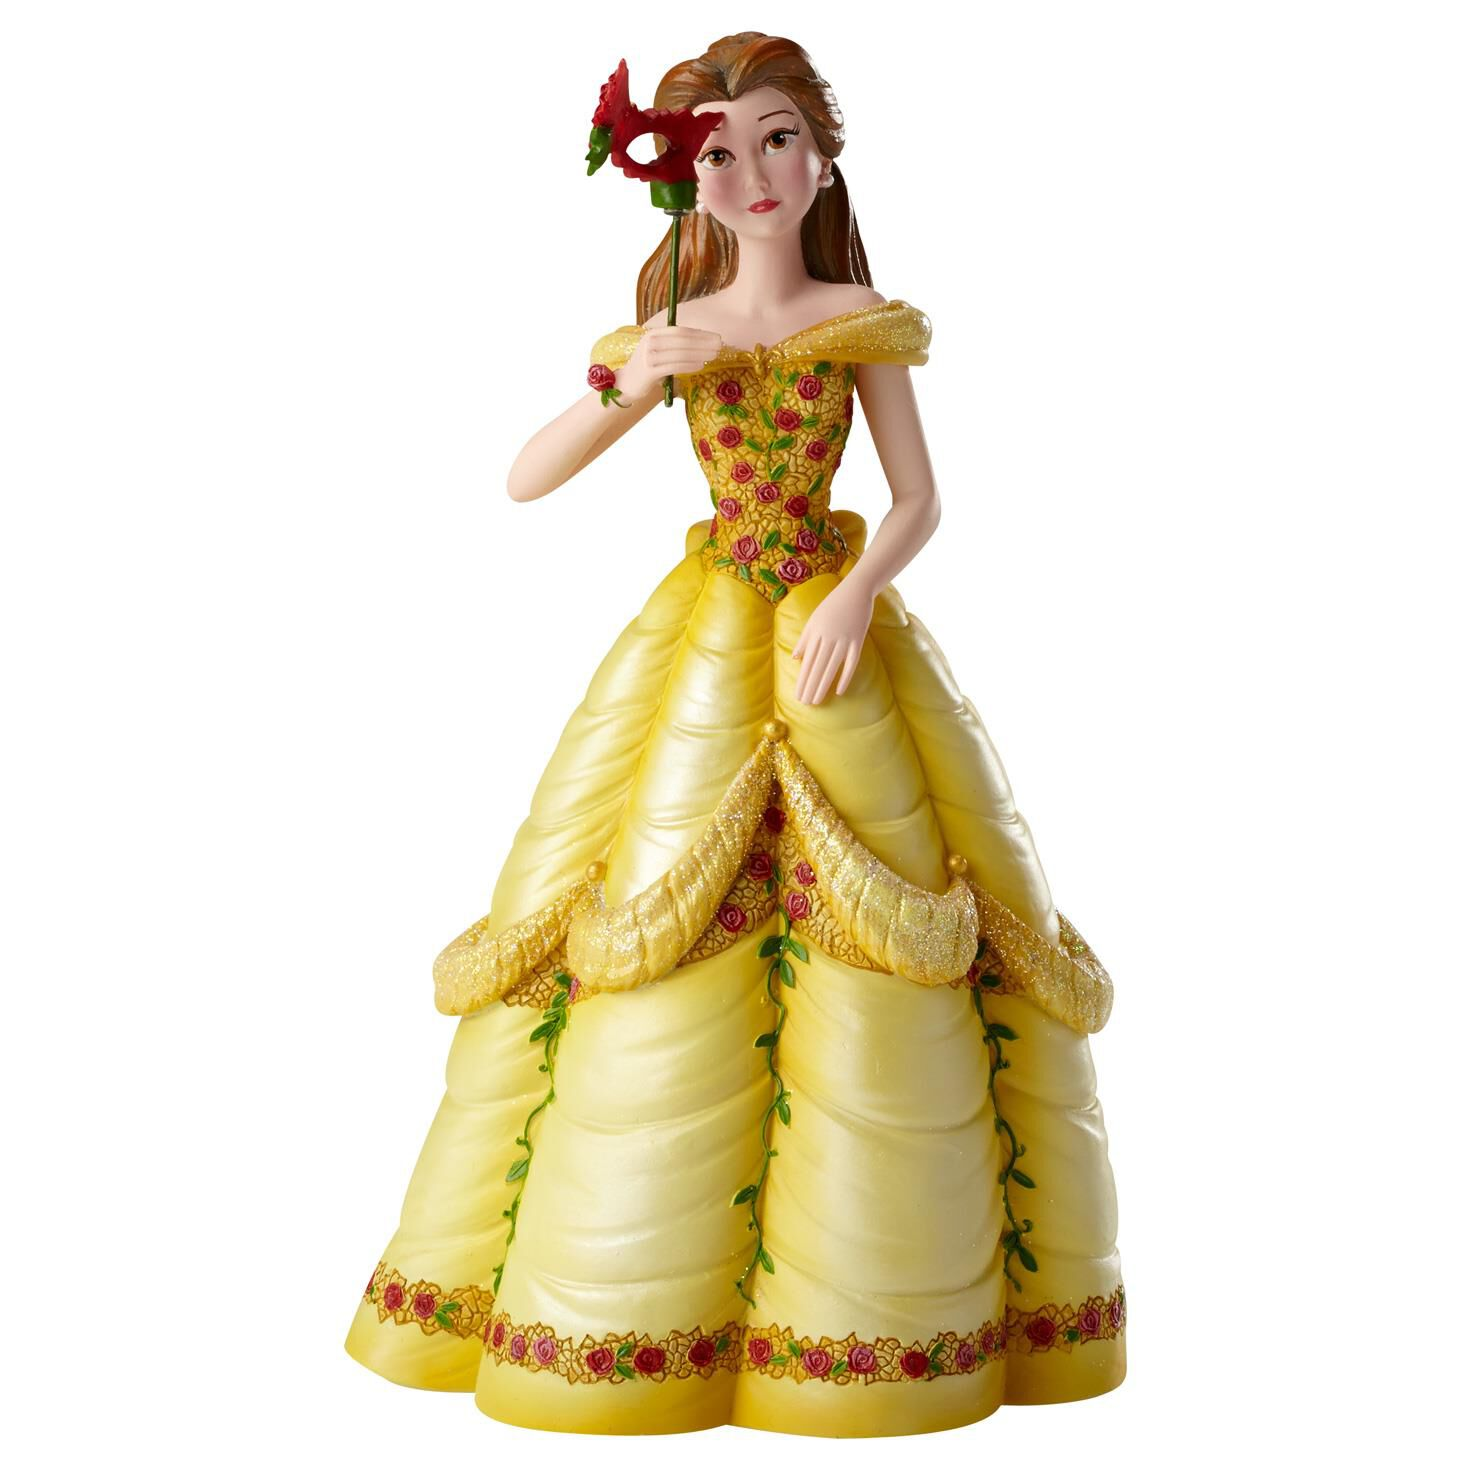 Belle ornament disney - Belle Ornament Disney 8